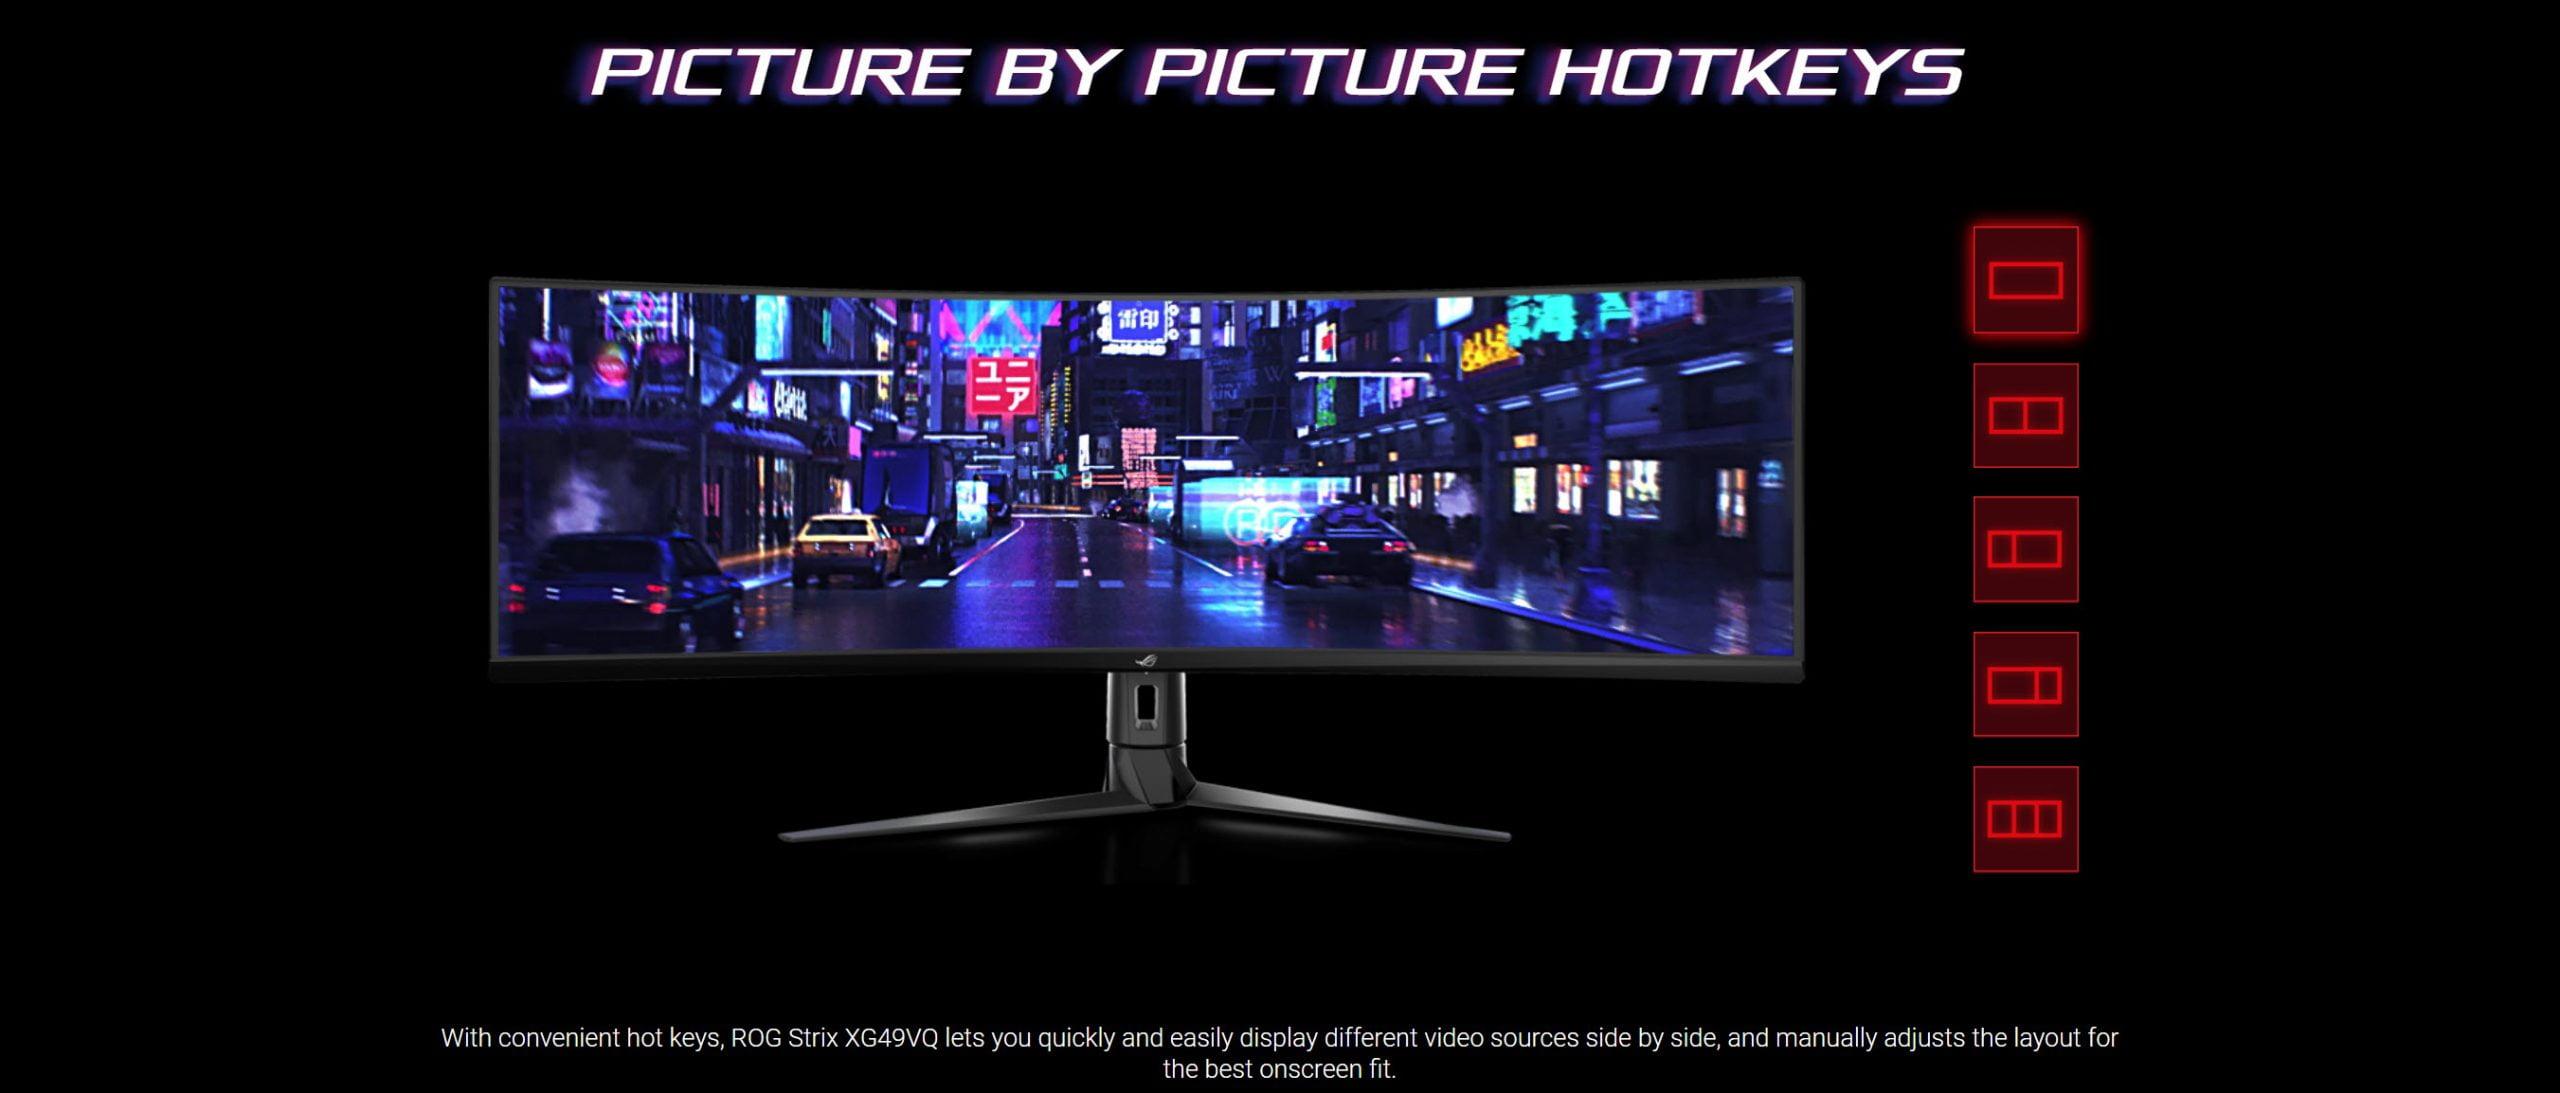 Asus ROG Strix XG49VQ 49″ Super Ultra-Wide HDR Gaming Monitor, 144Hz – New